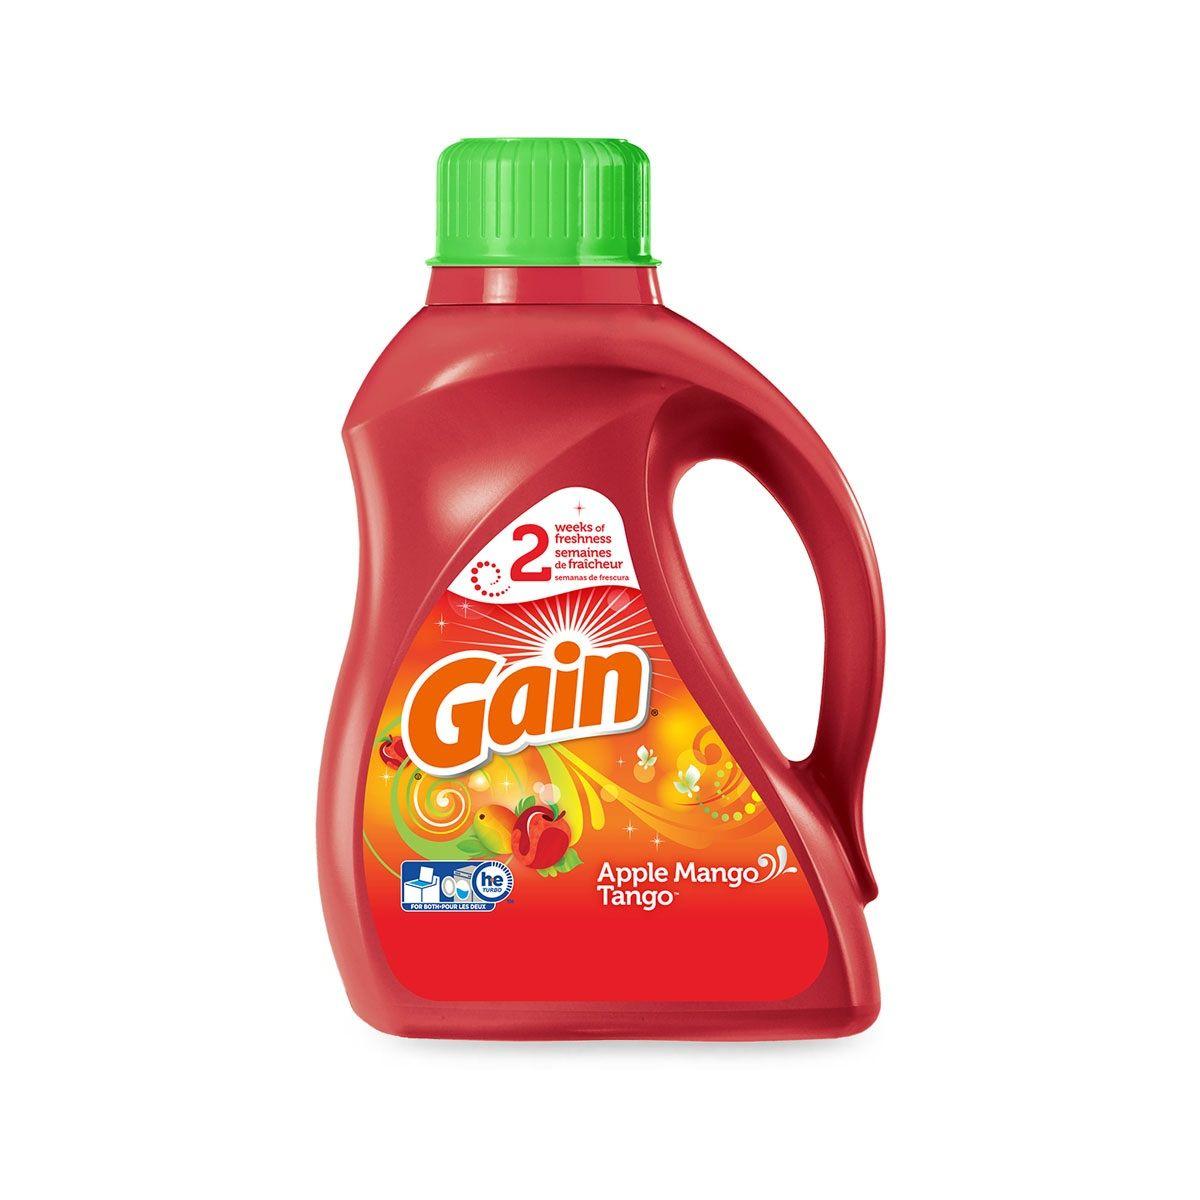 Gain liquid laundry detergent products laundry detergent